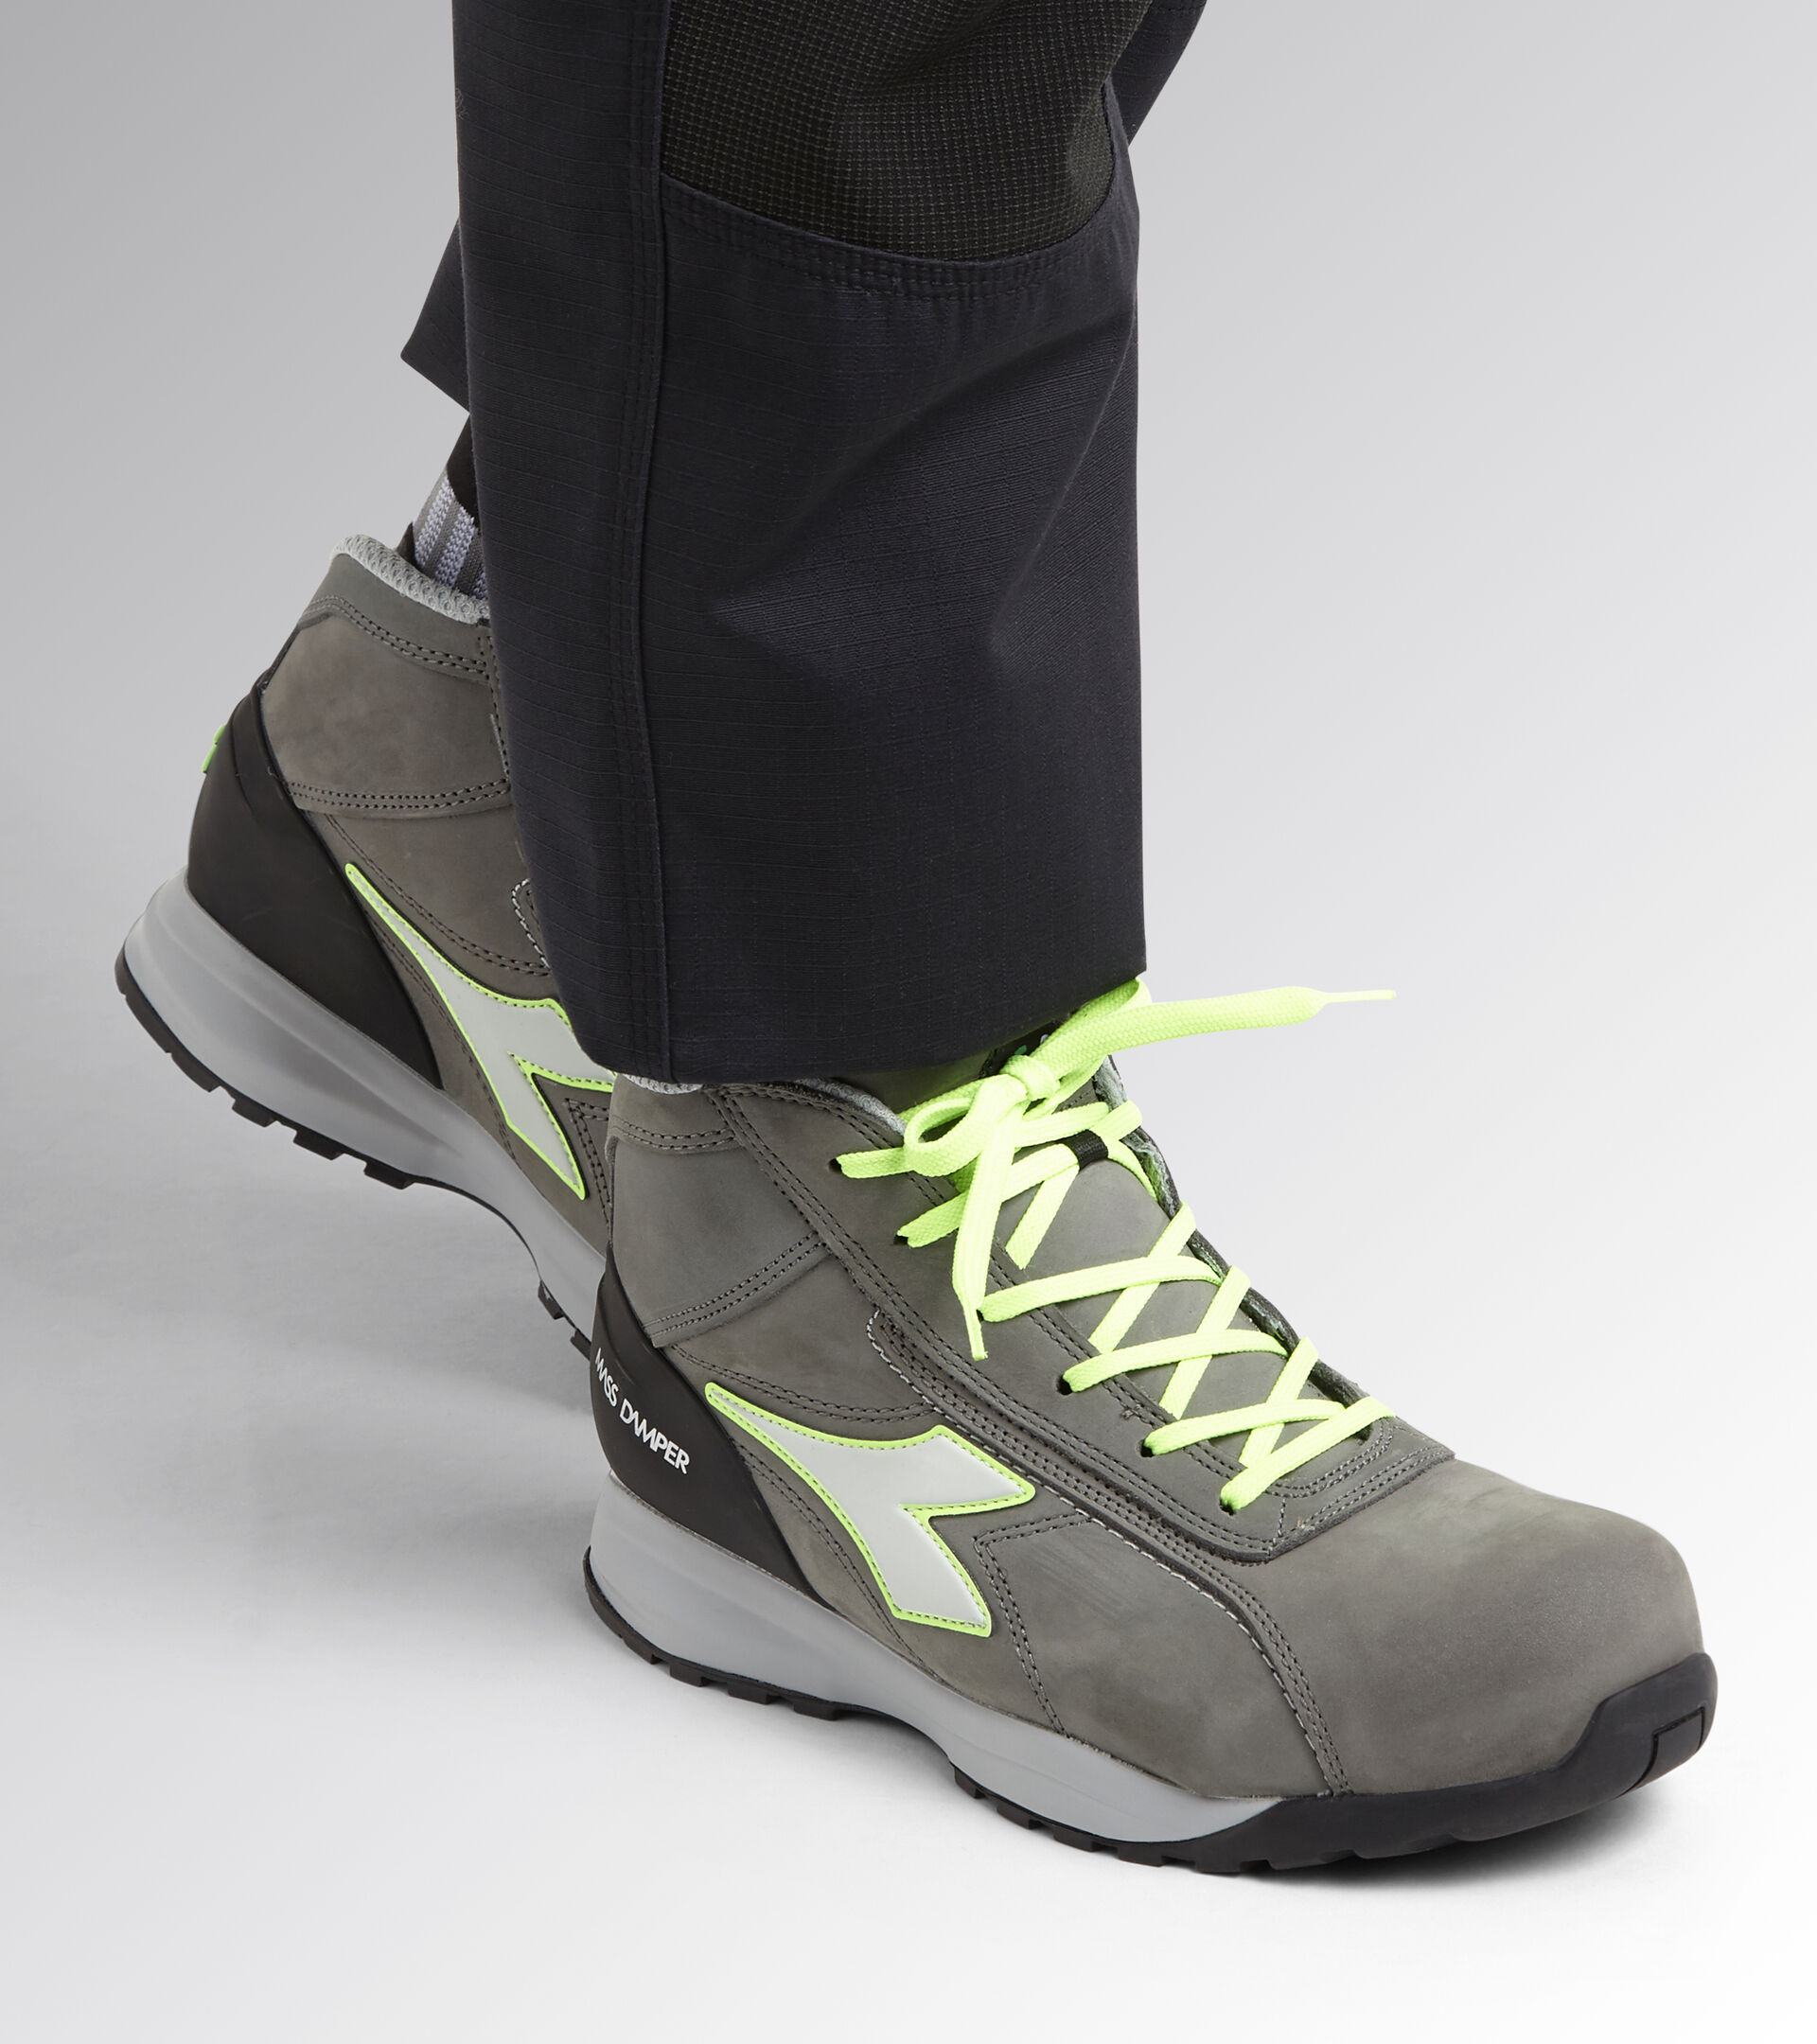 Footwear Utility UNISEX GLOVE MDS MID S3 HRO SRC COAL/GREEN FLUO Utility